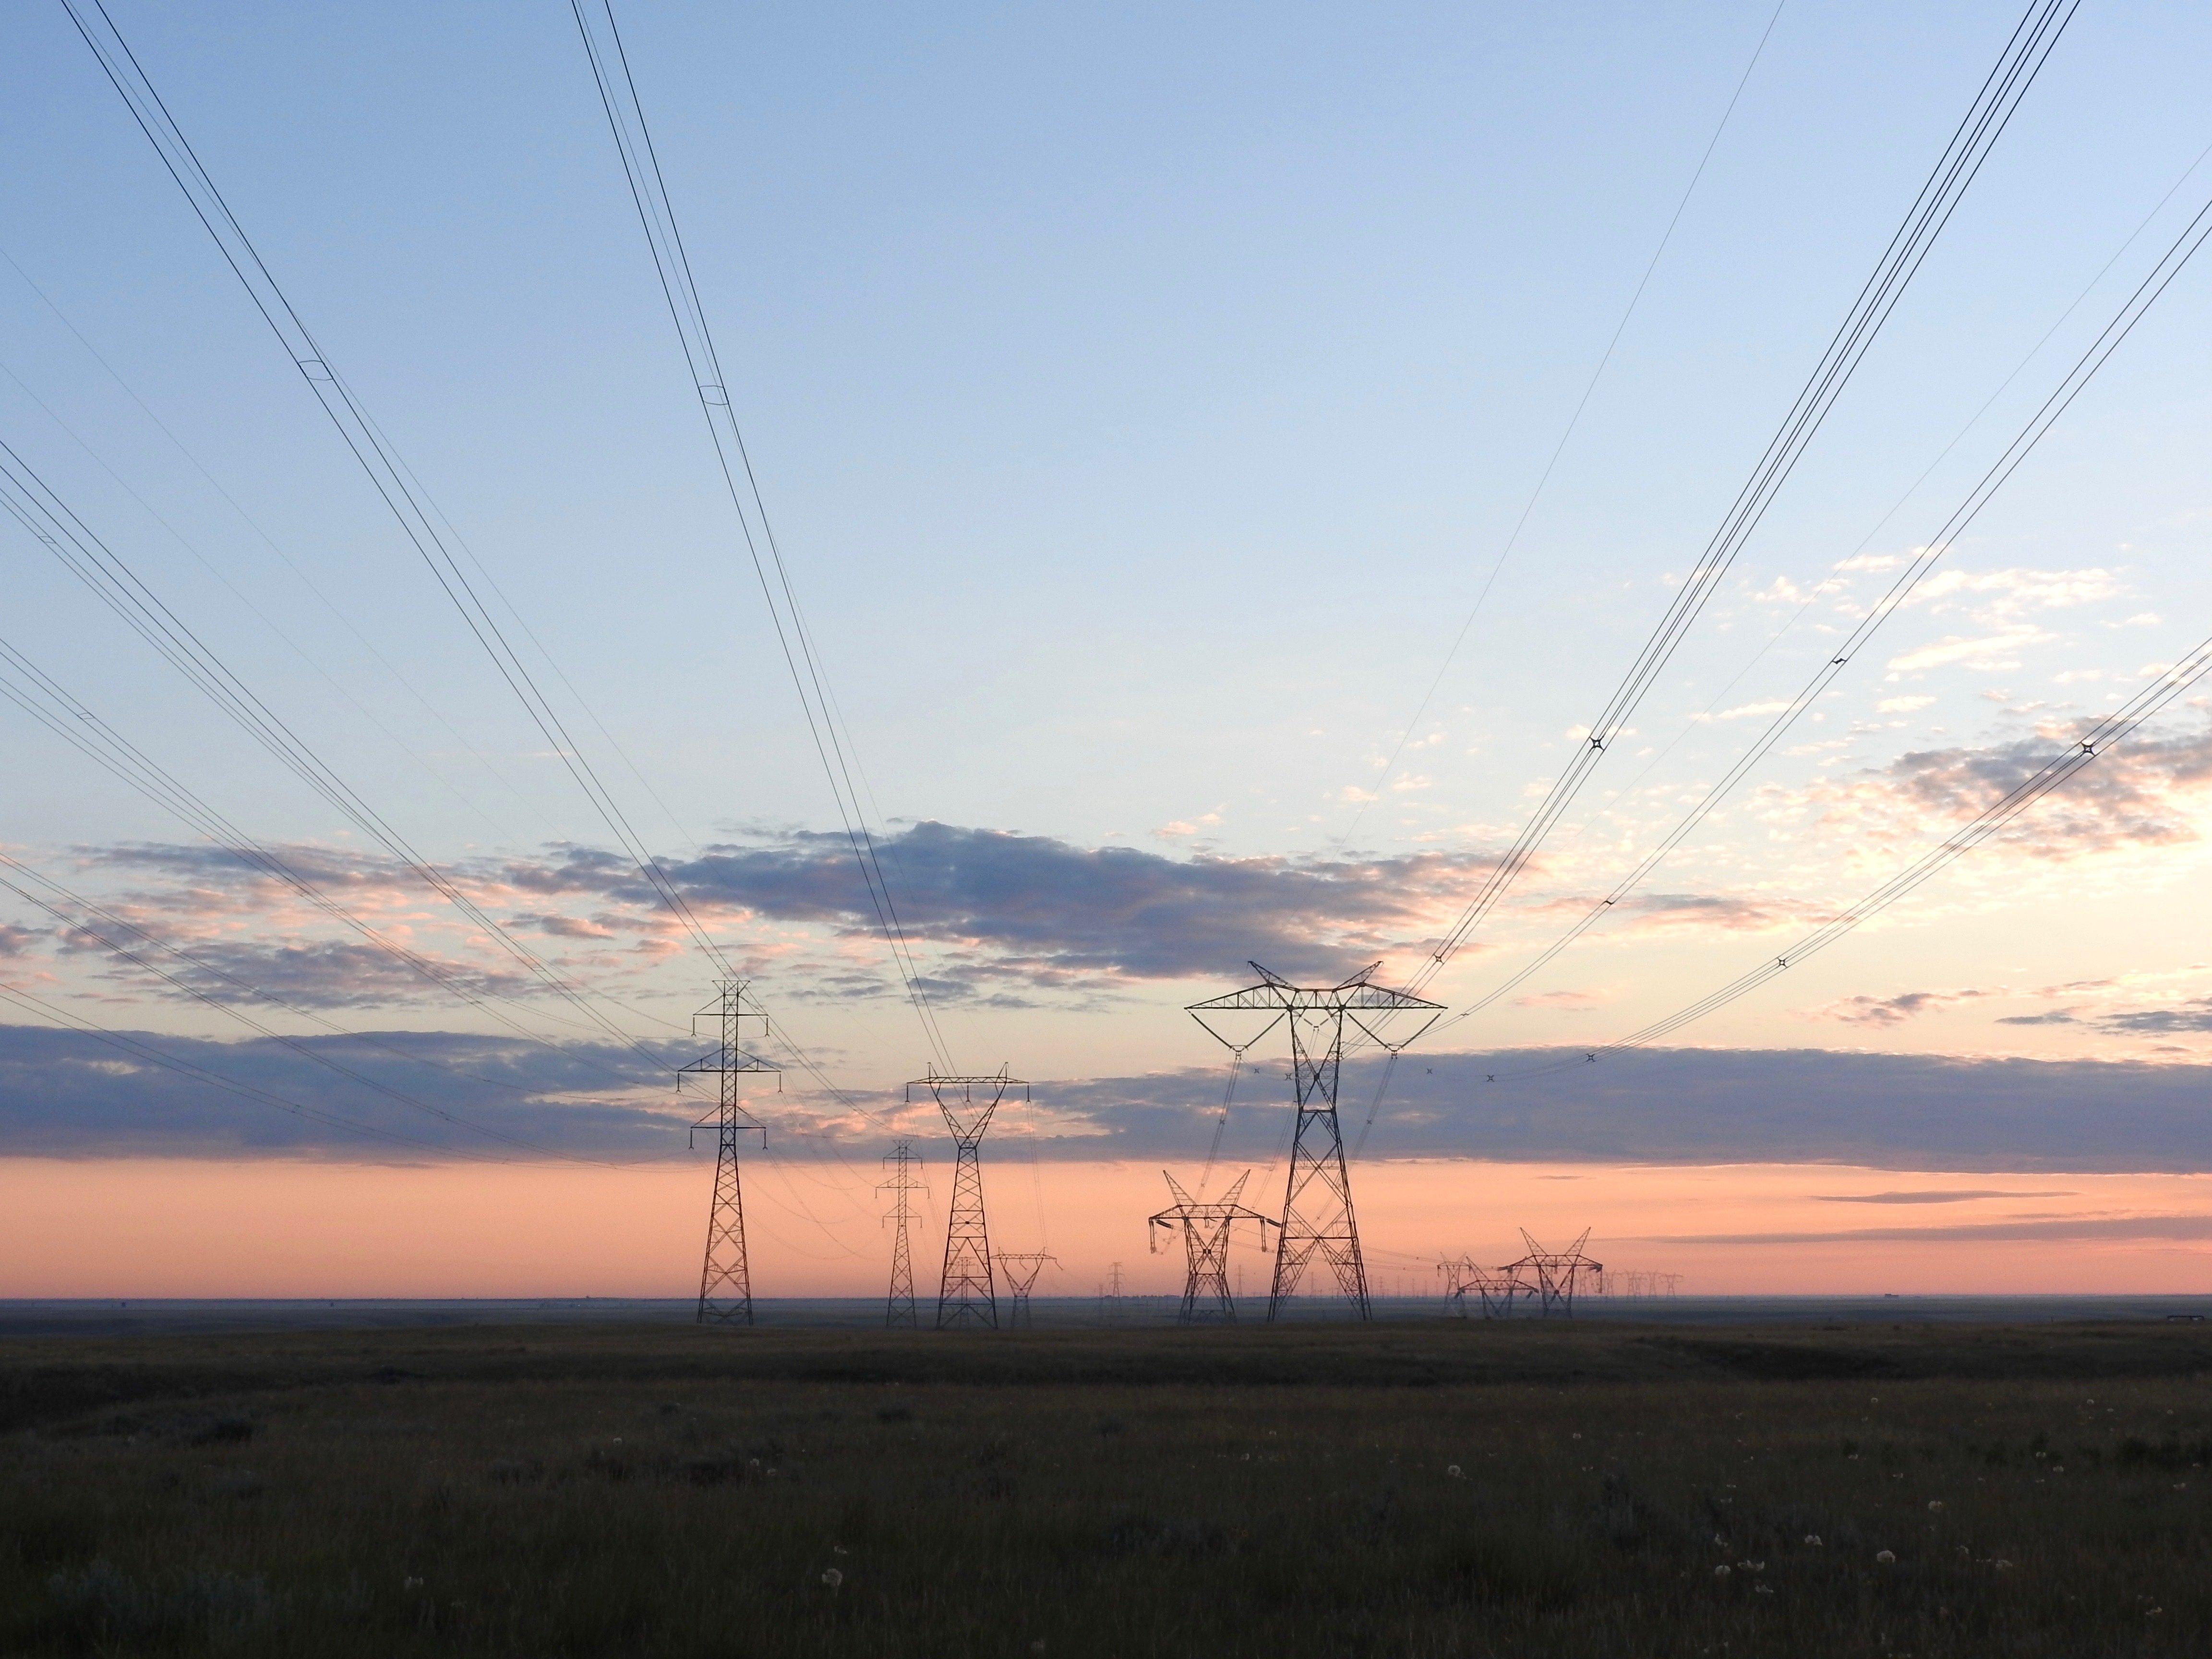 prairie power lines